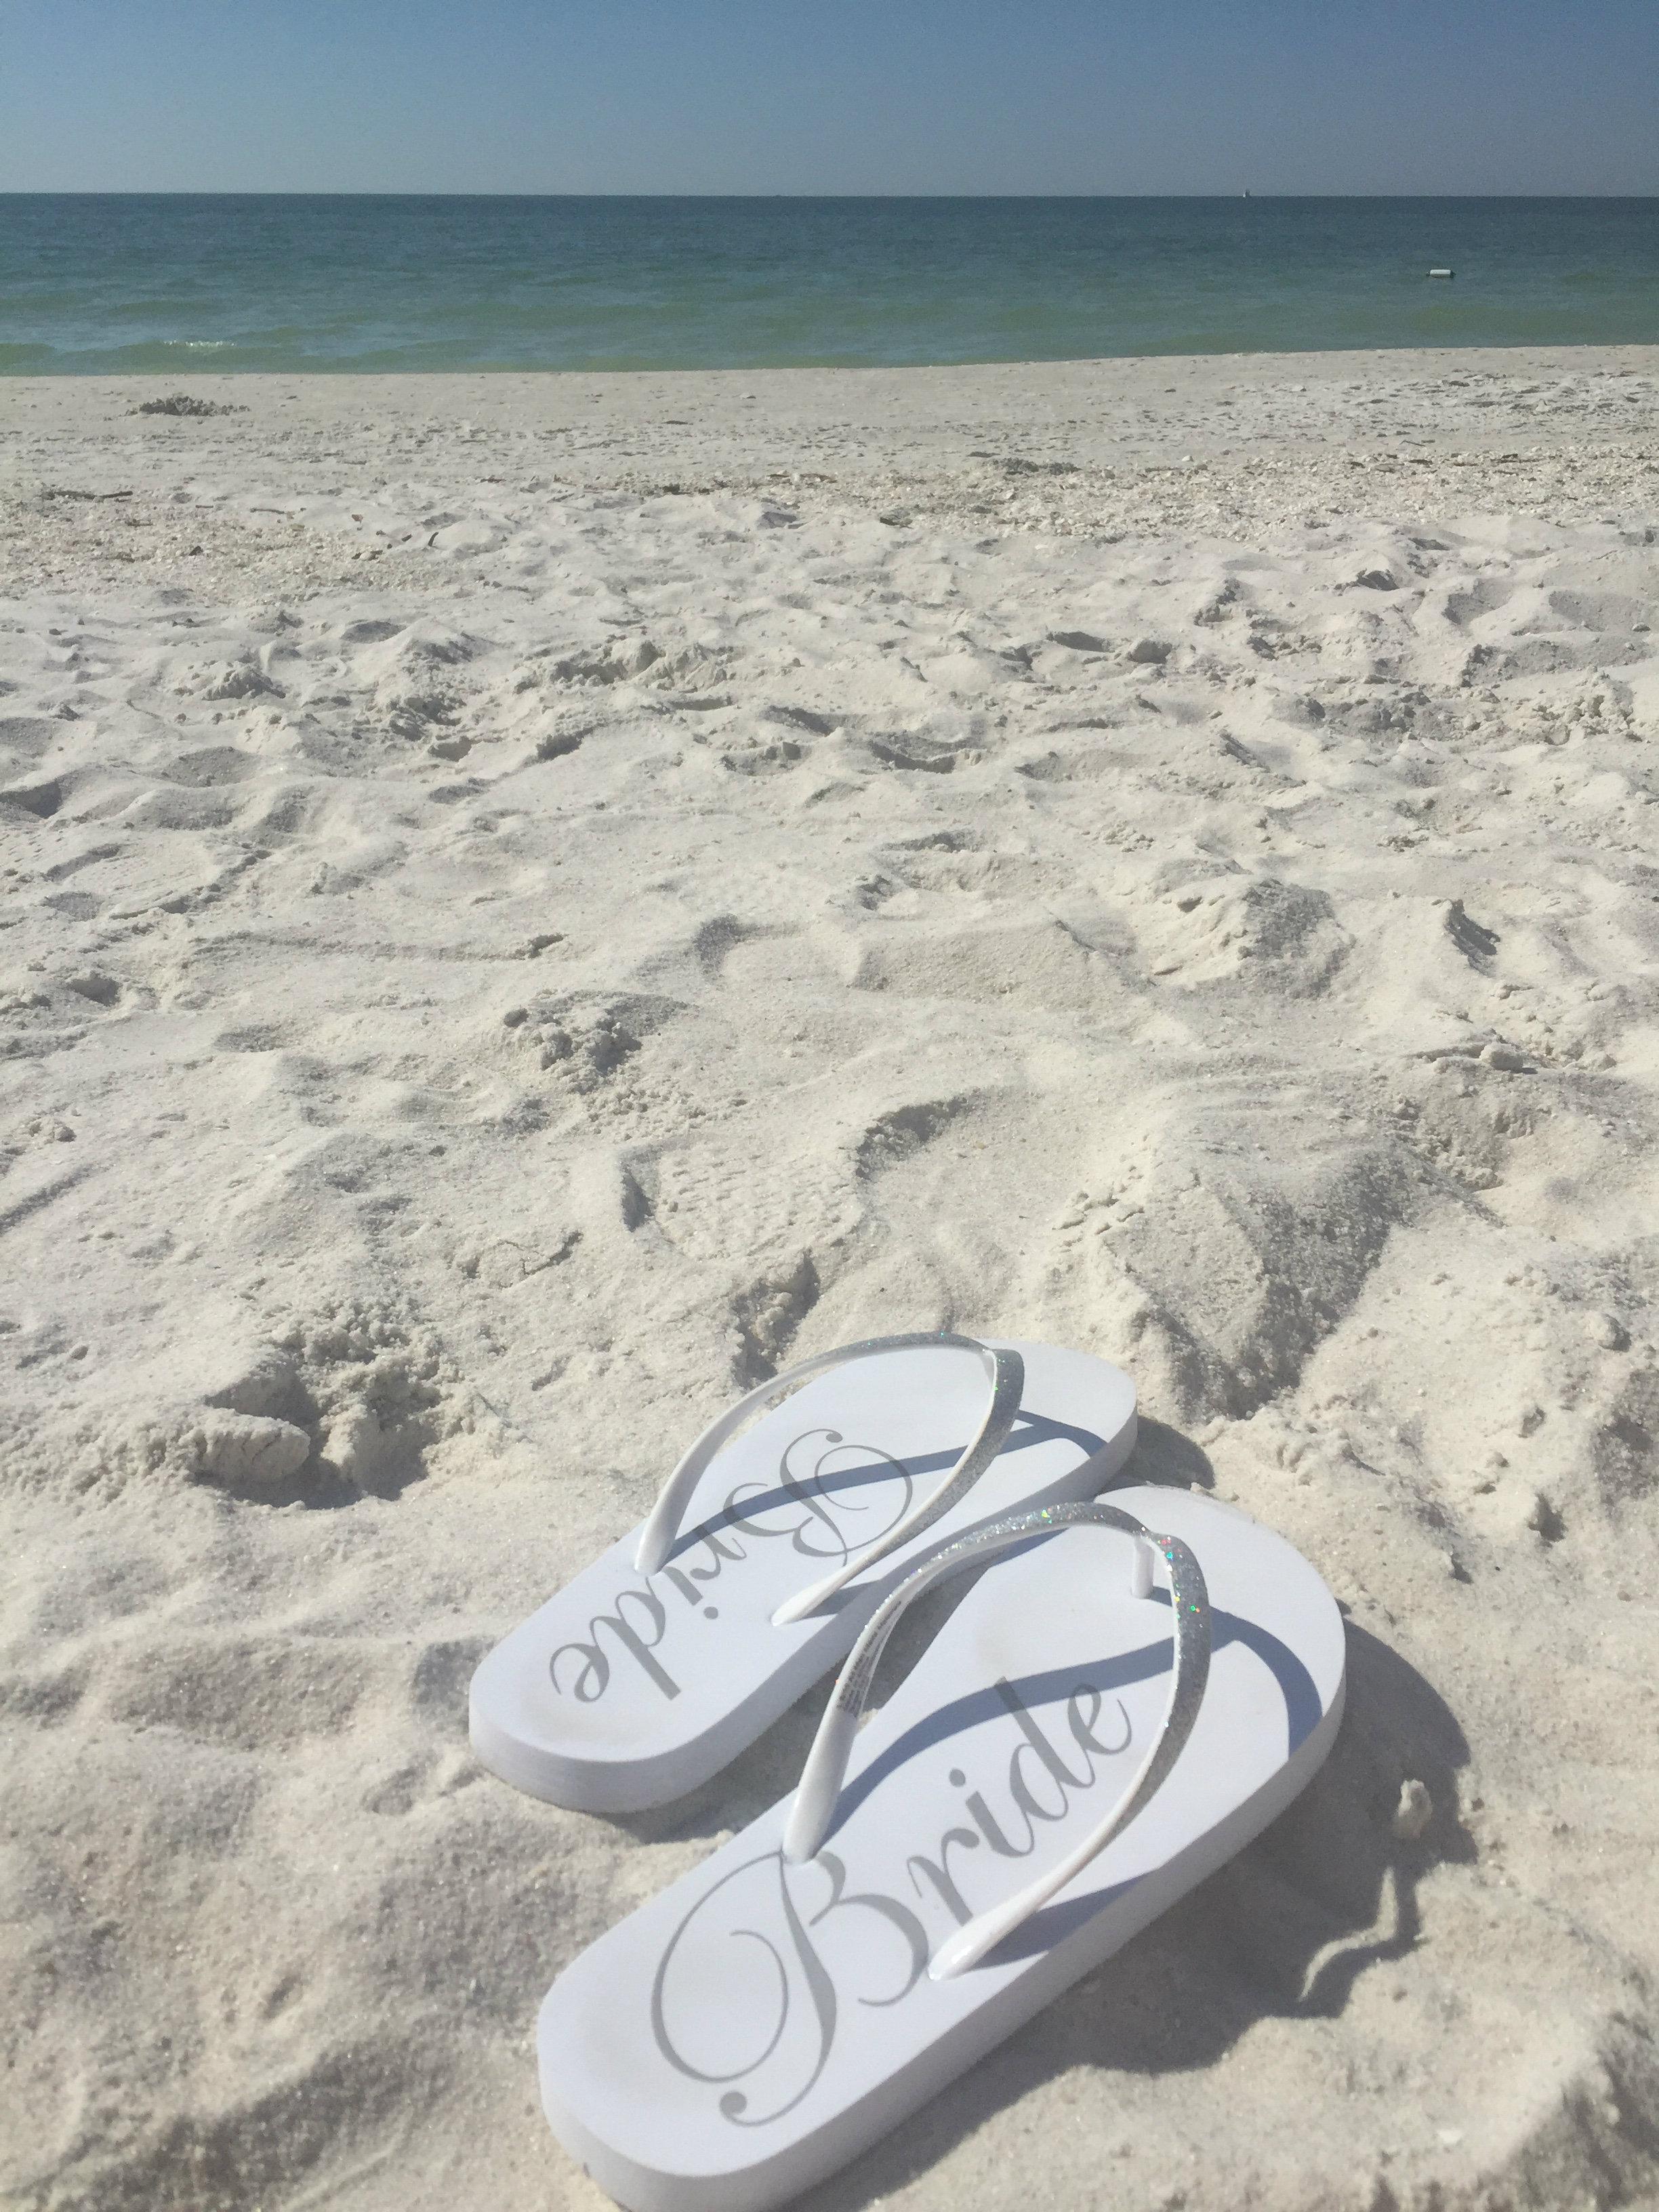 sober bachelorette party Marco Island Florida